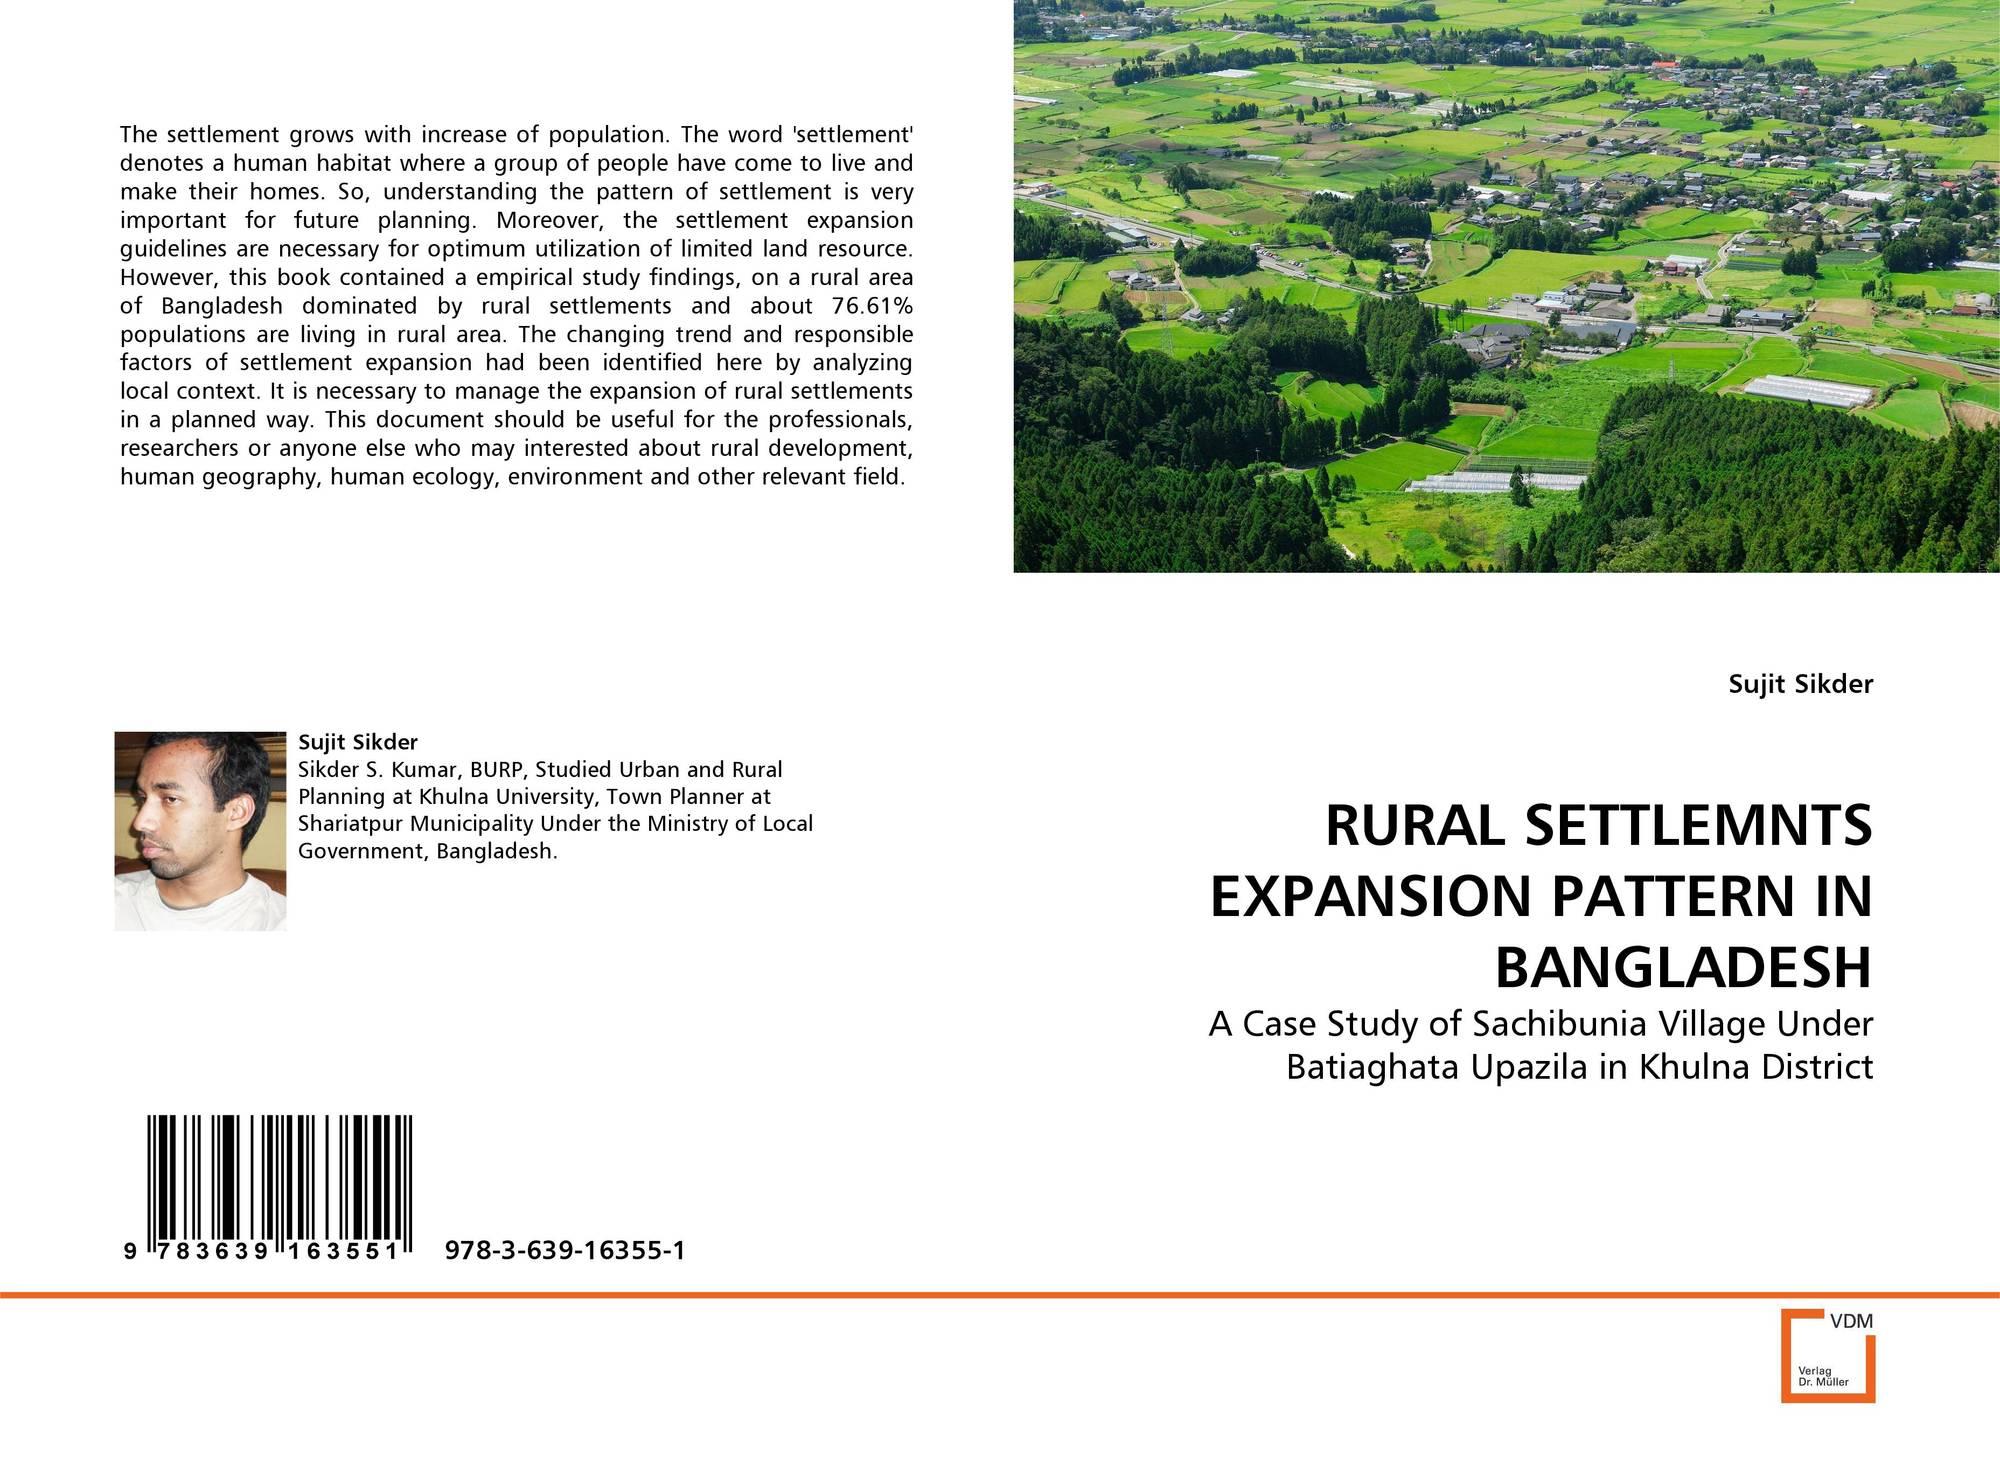 RURAL SETTLEMNTS EXPANSION PATTERN IN BANGLADESH, 978-3-639